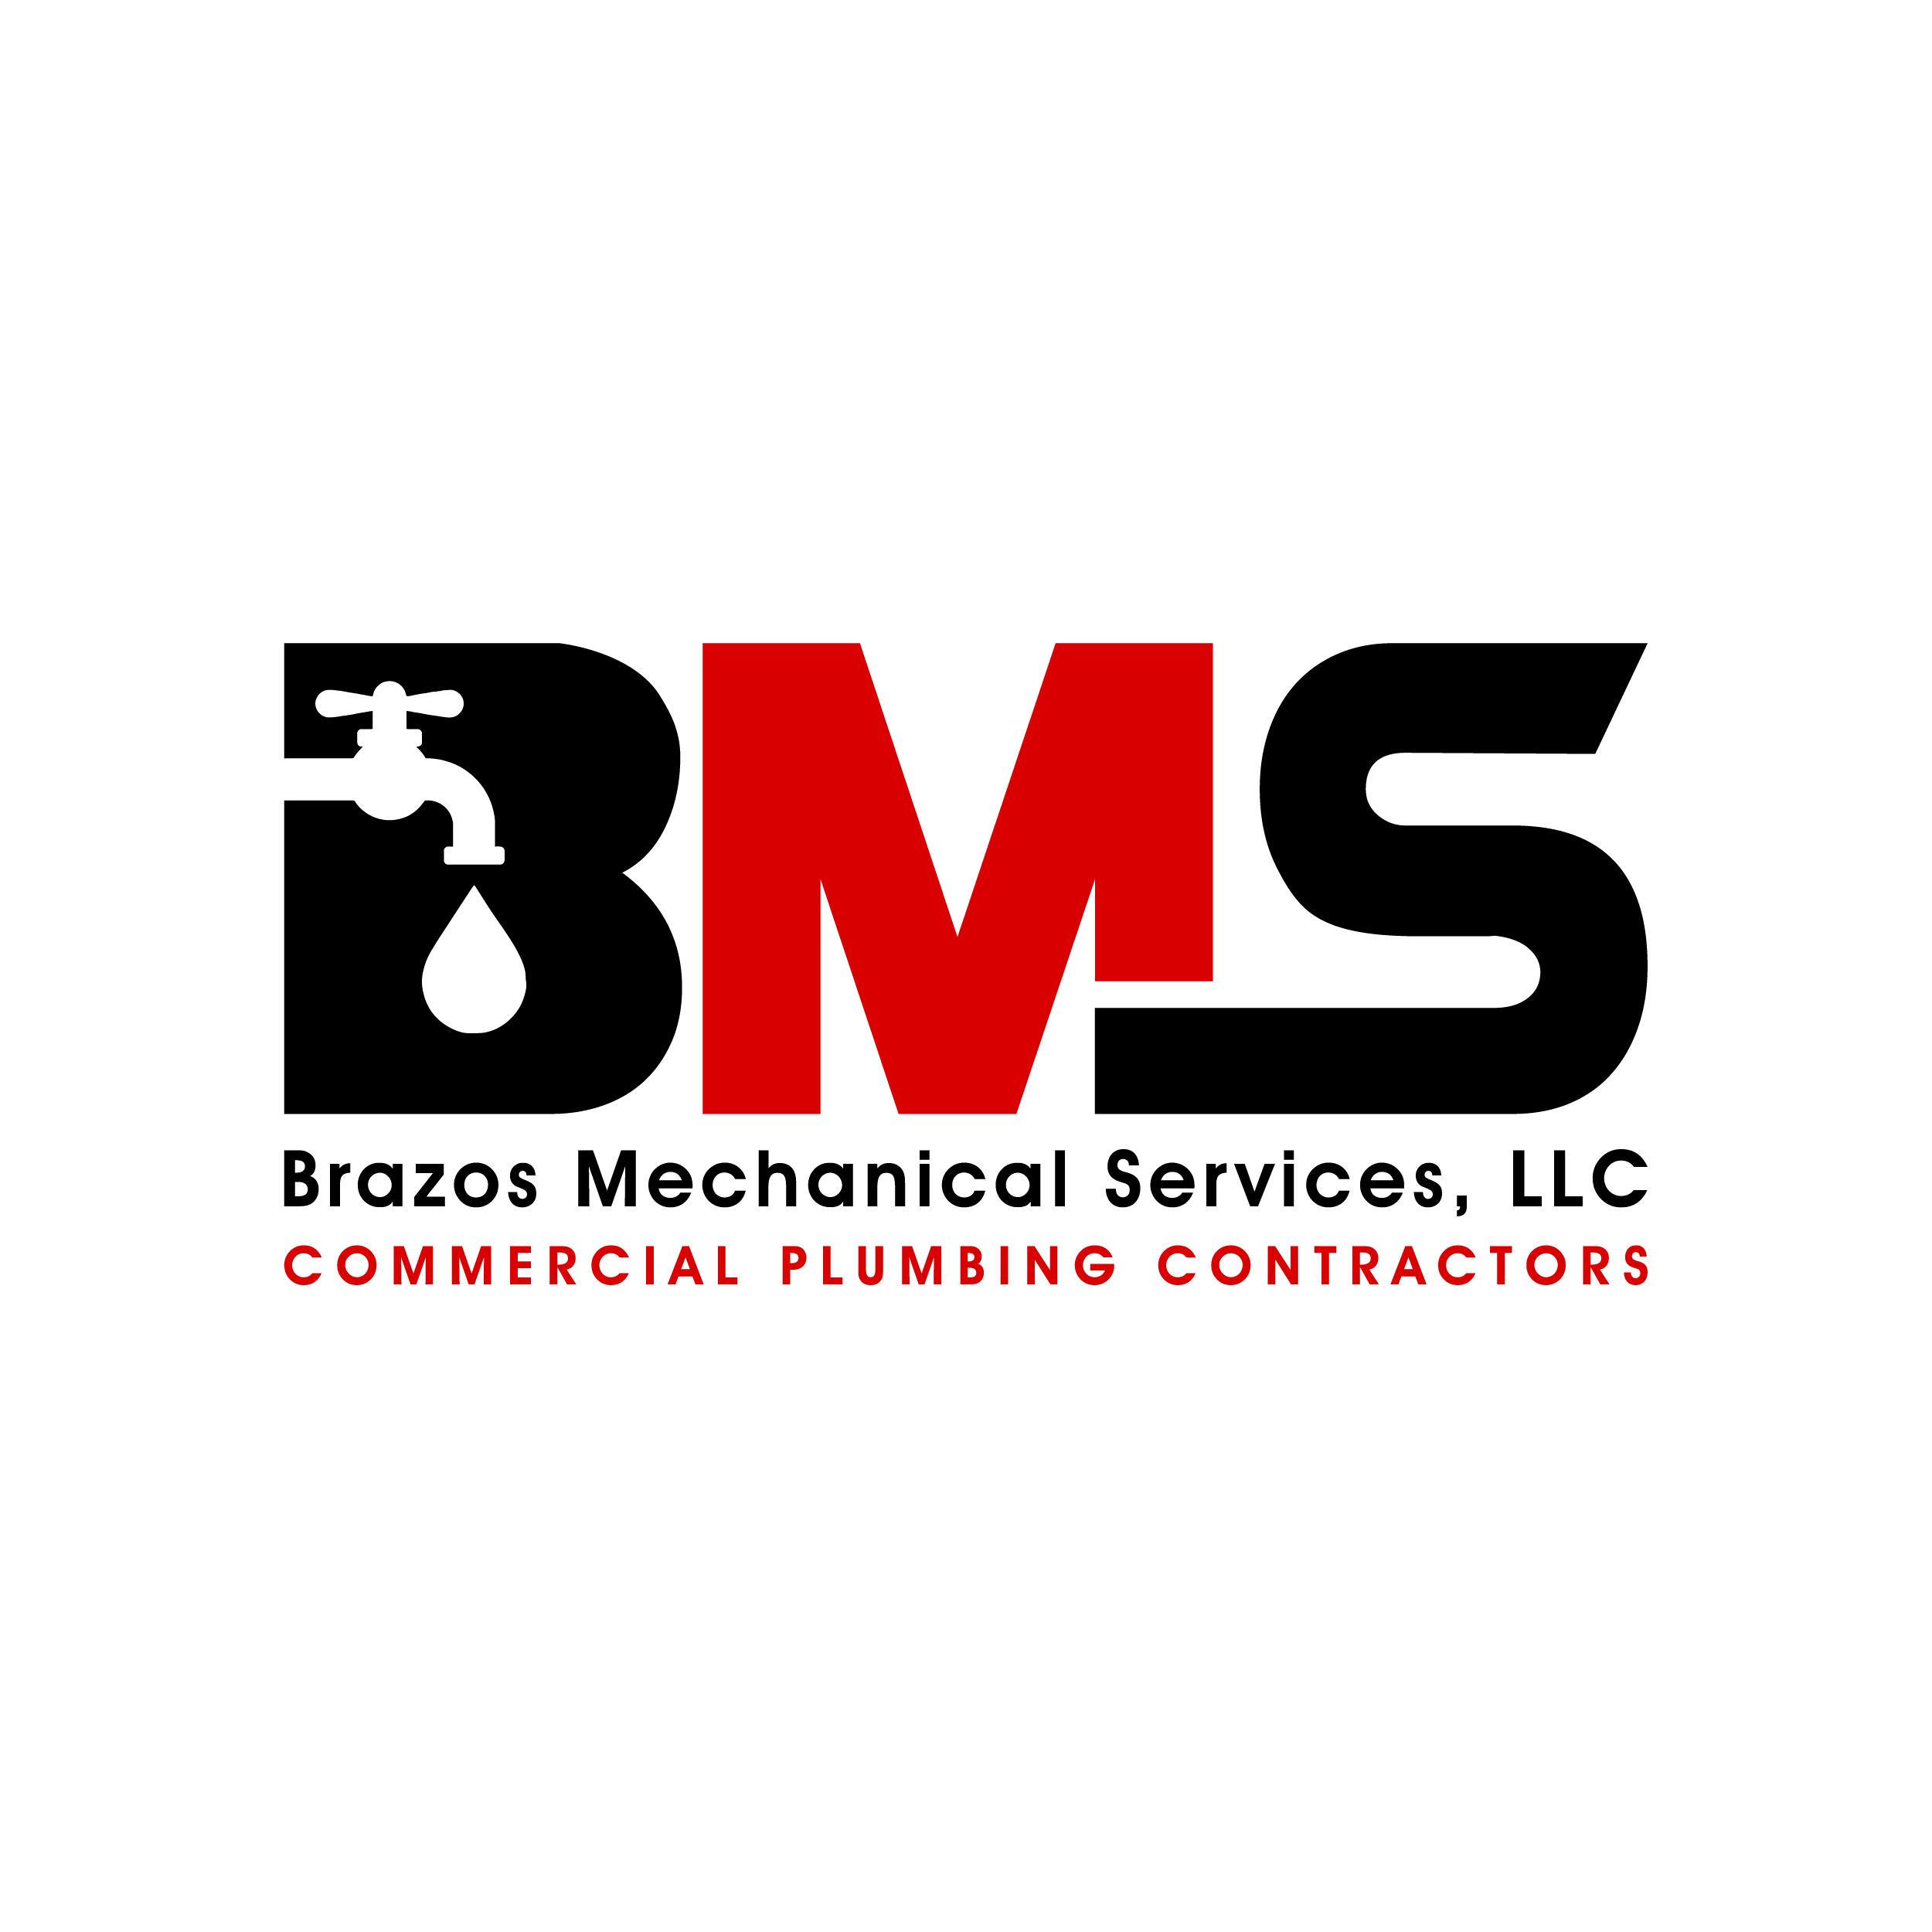 Brazos Mechanical Services, LLC